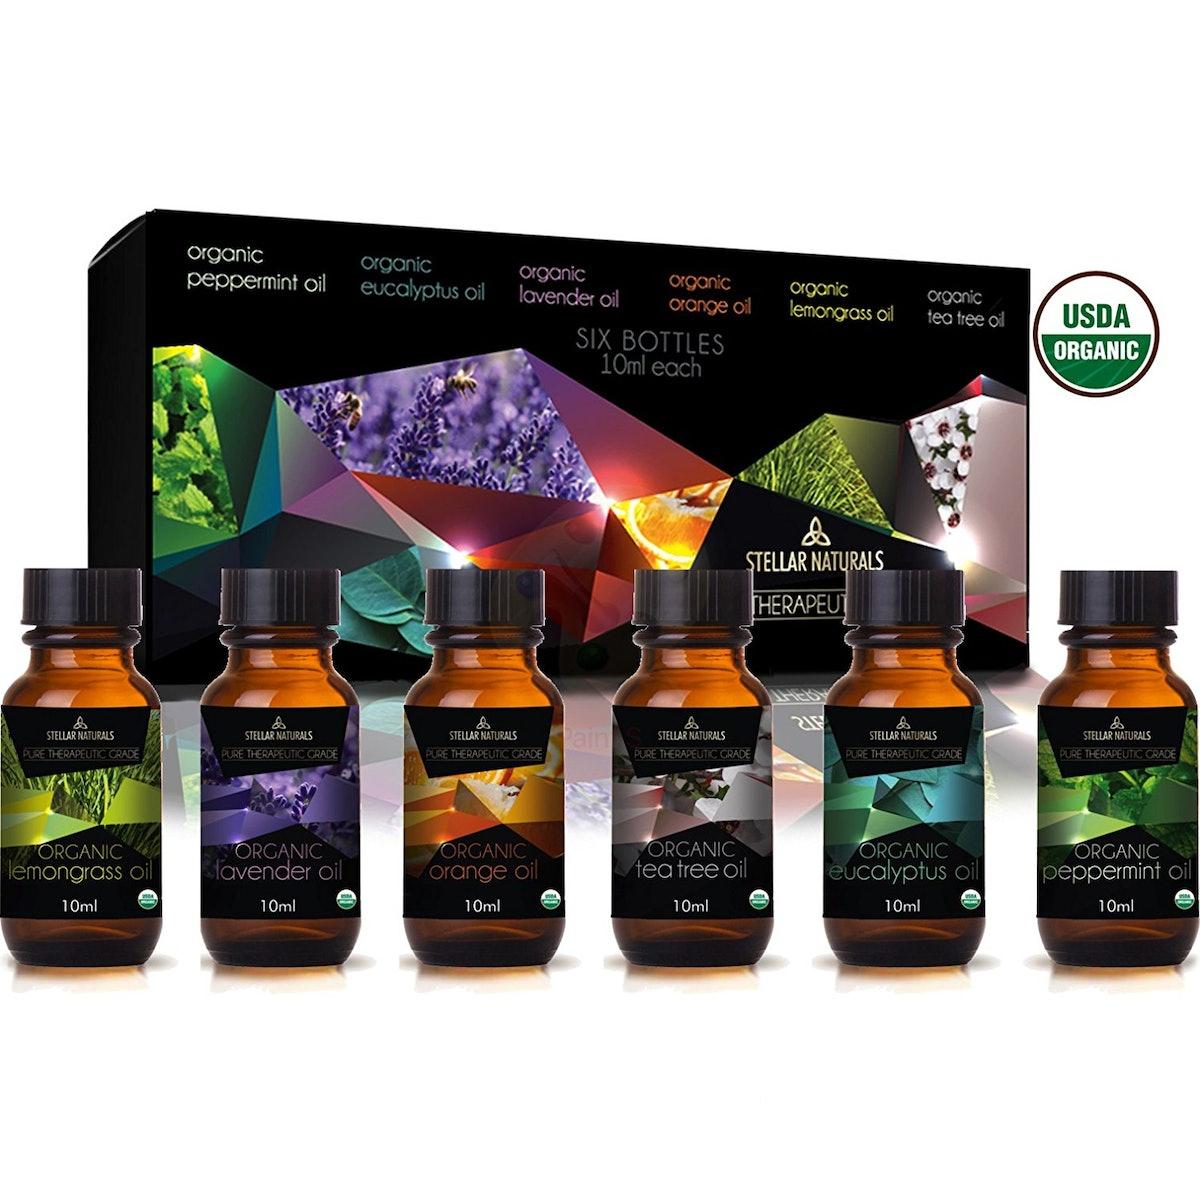 Stellar Naturals USDA-Certified Organic Essential Oils, 10 ml (6 Pack)